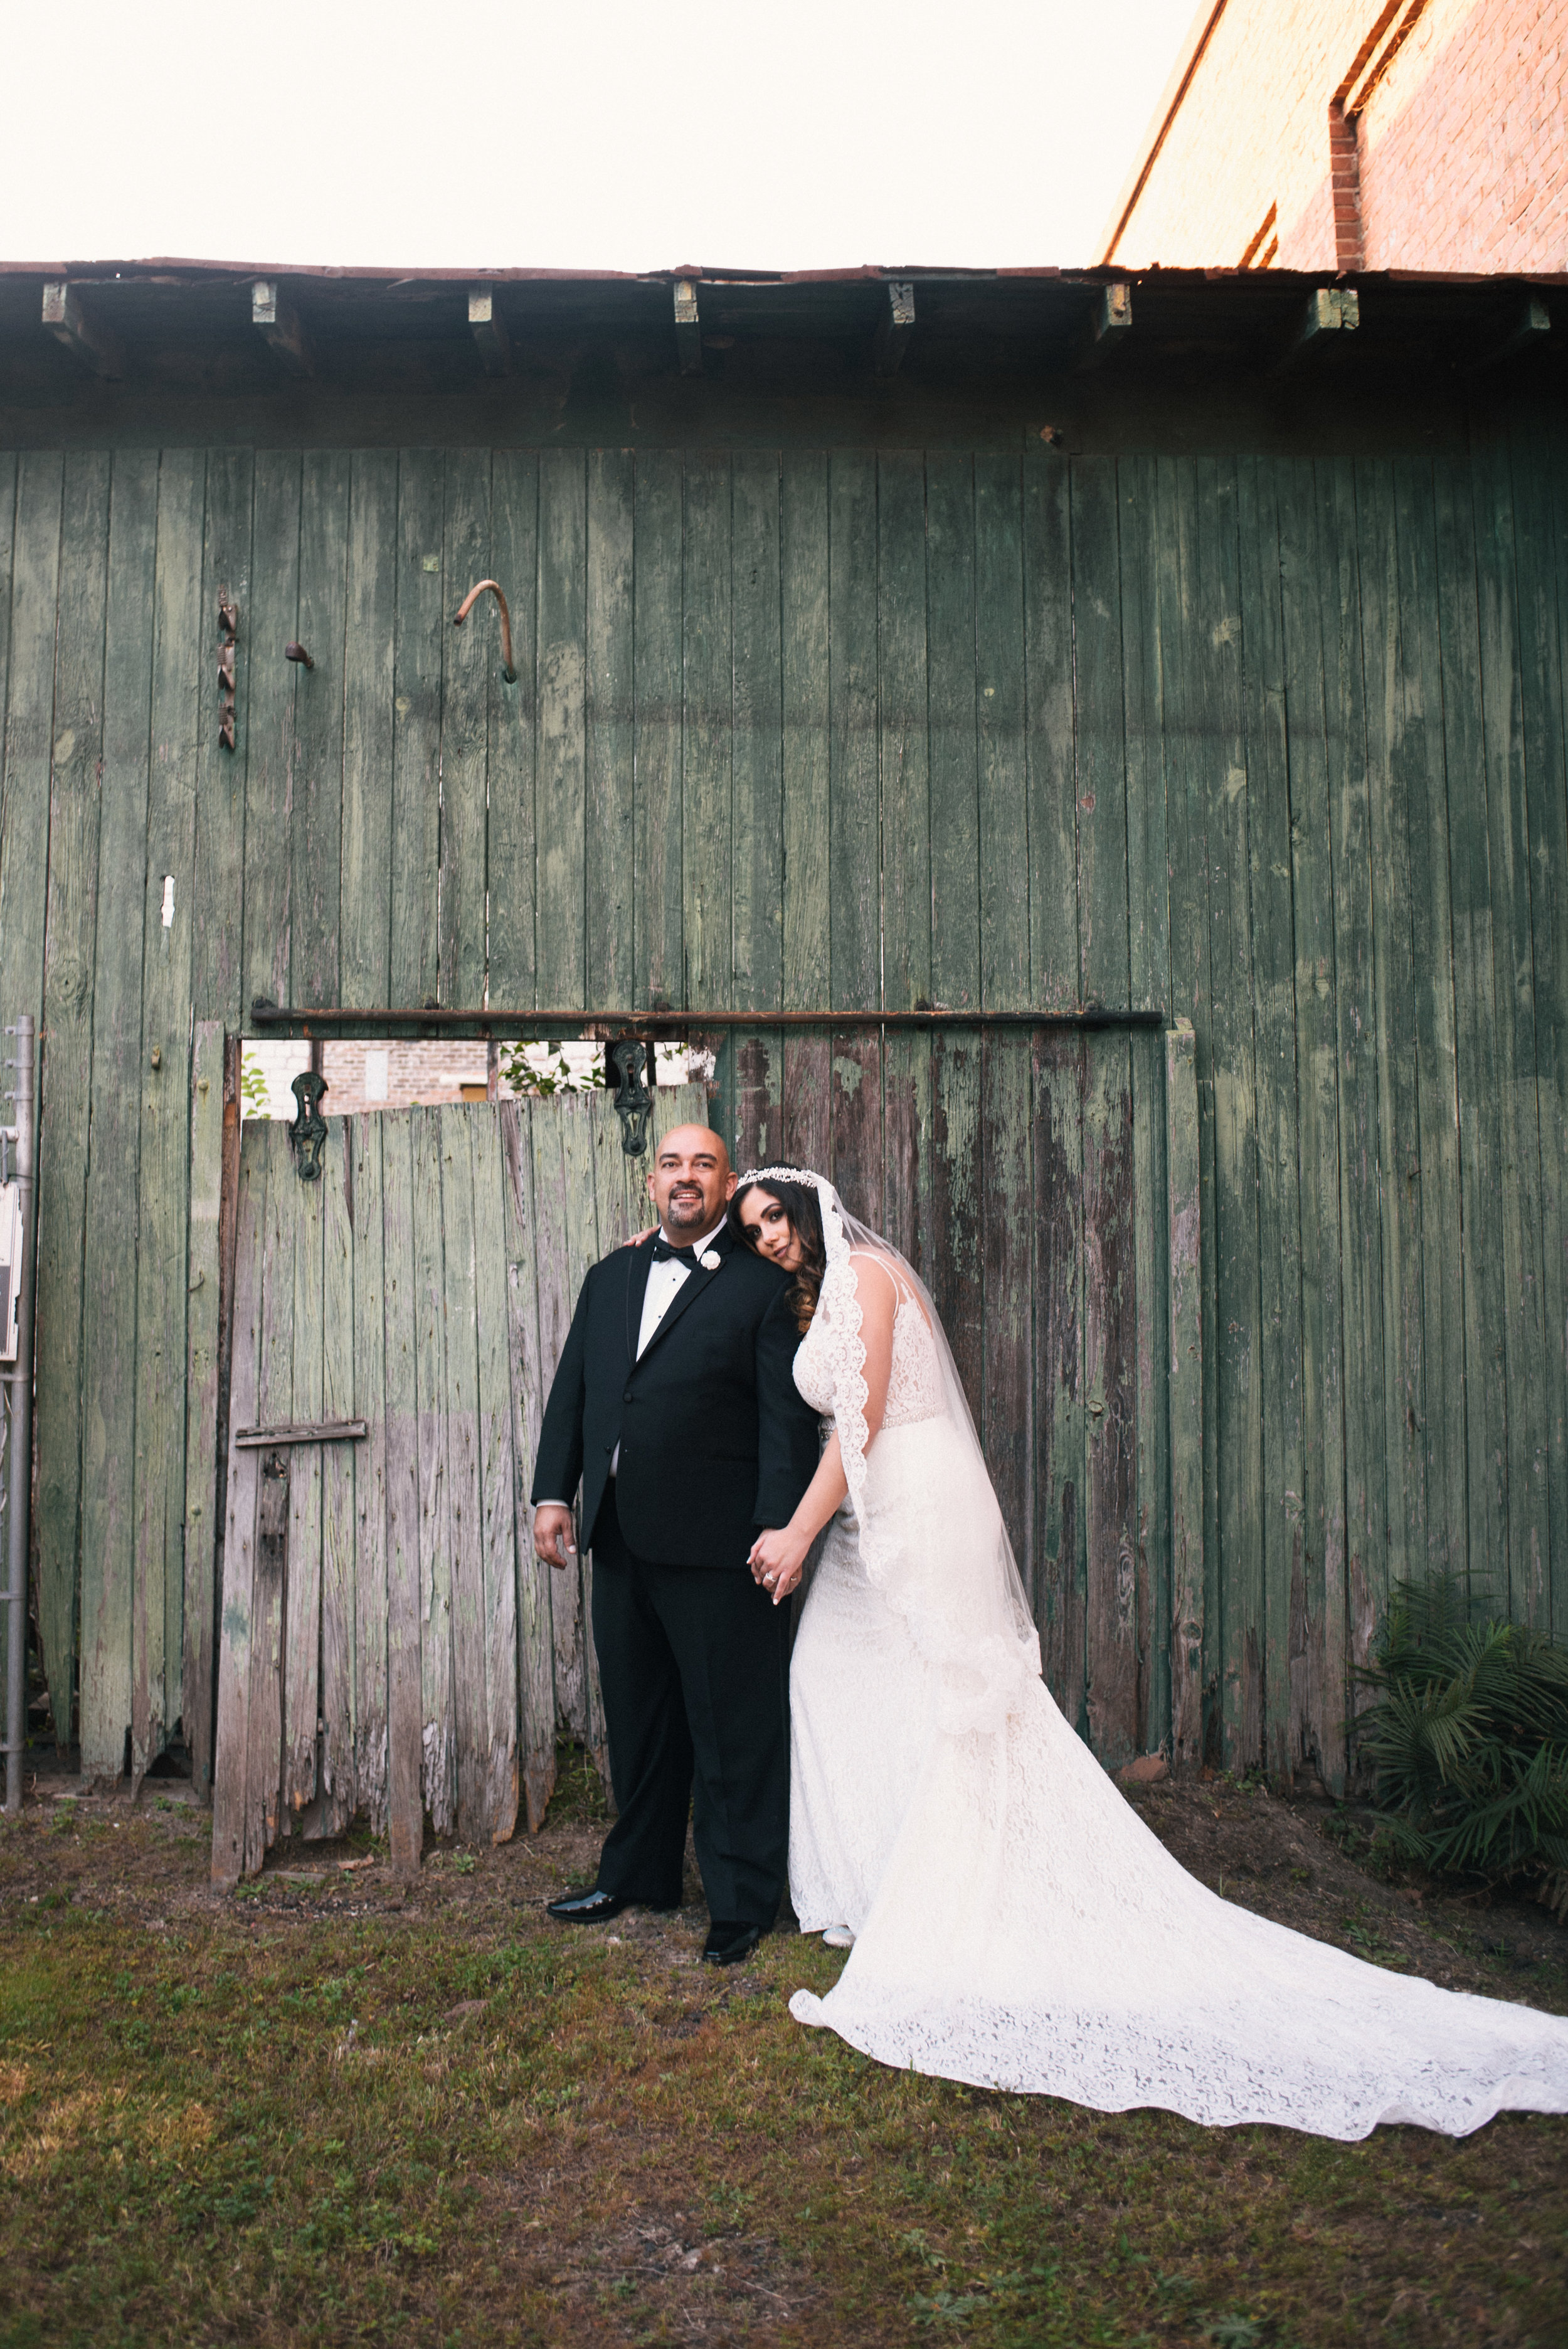 Iggy-and-yesenia-savannah-railroad-museum-wedding-meg-hill-photo- (698 of 1037).jpg